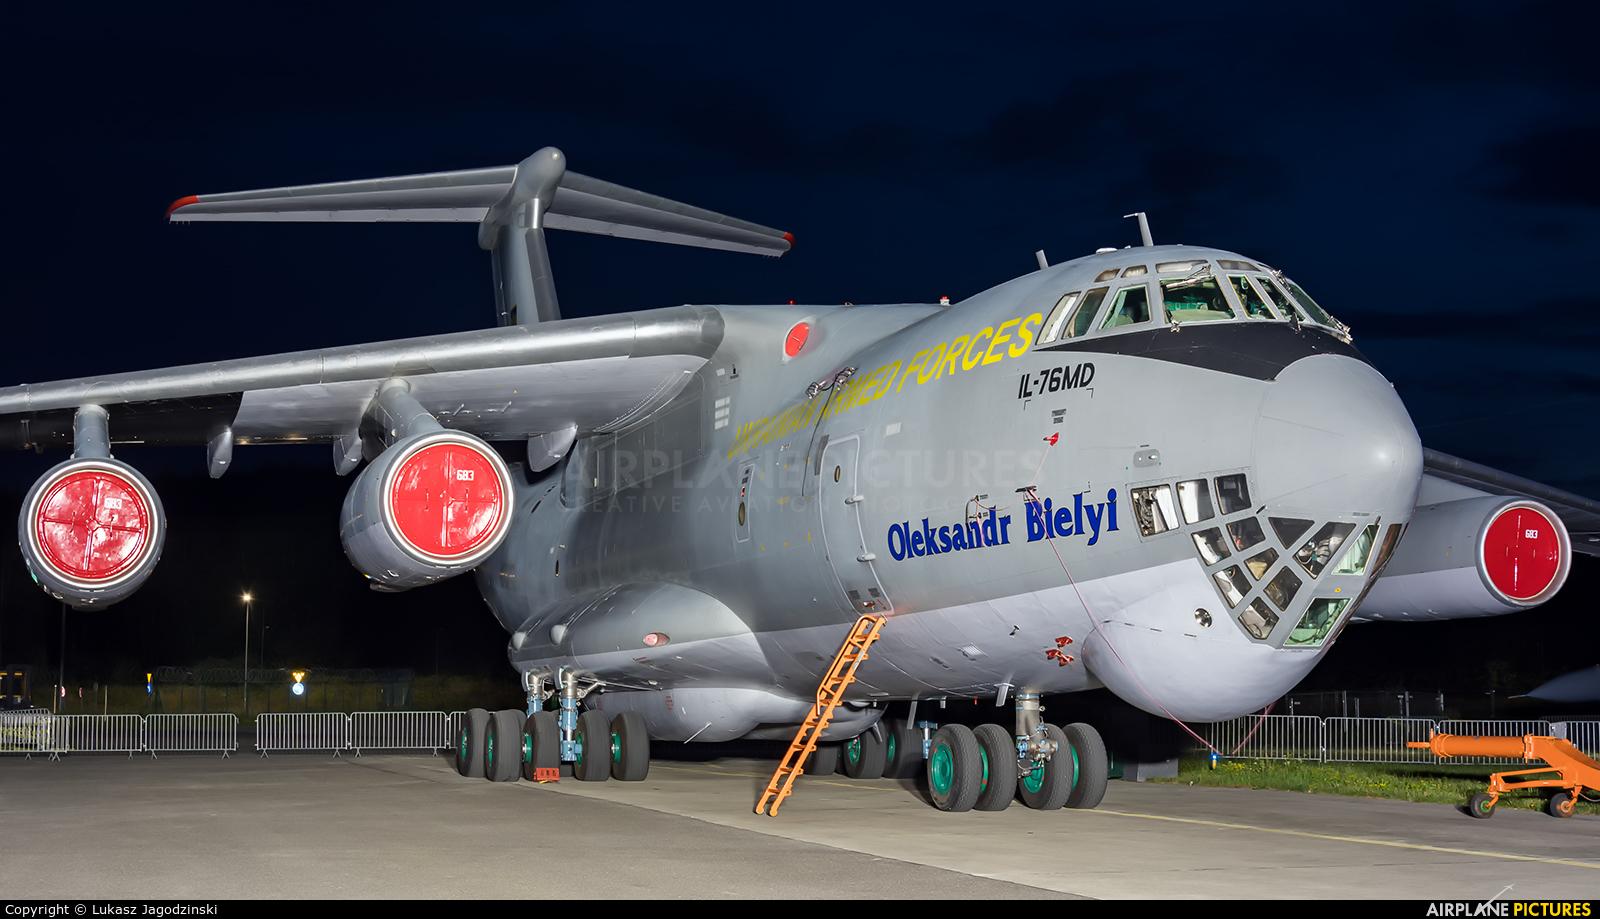 Ukraine - Air Force 76683 aircraft at Gdynia- Babie Doły (Oksywie)